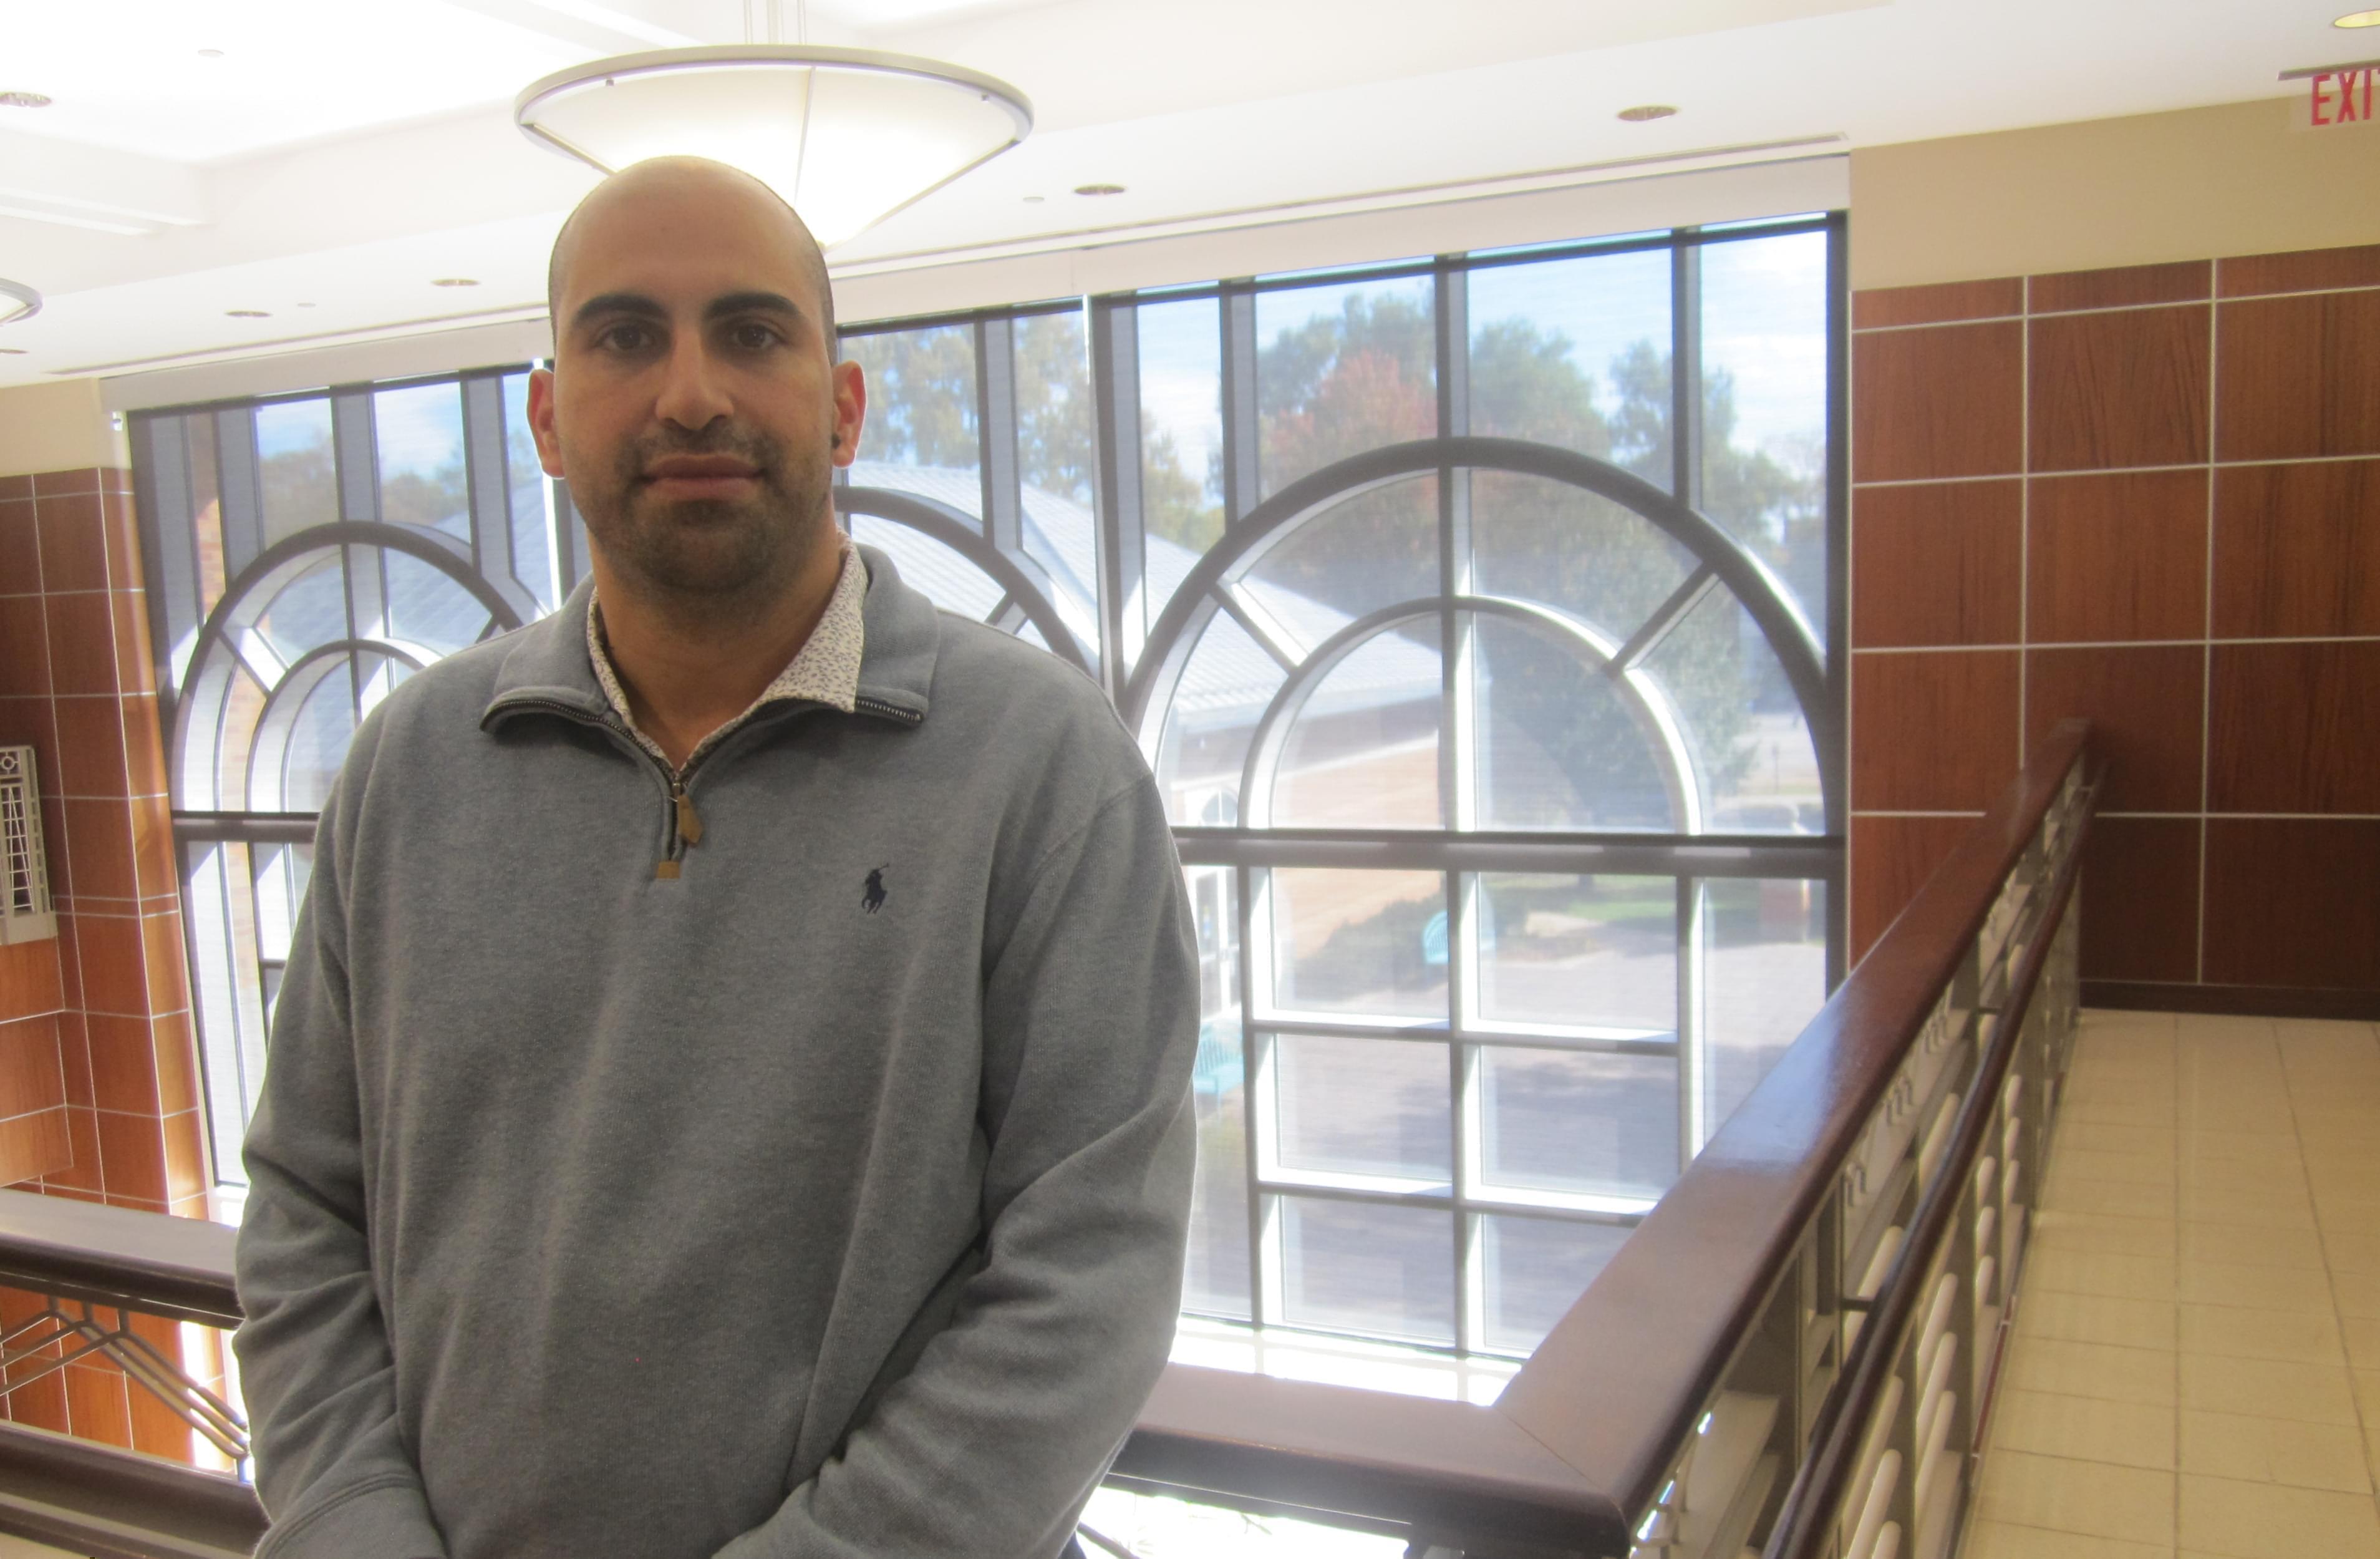 Visiting Prof. Steven Salaita of the American University of Beirut.